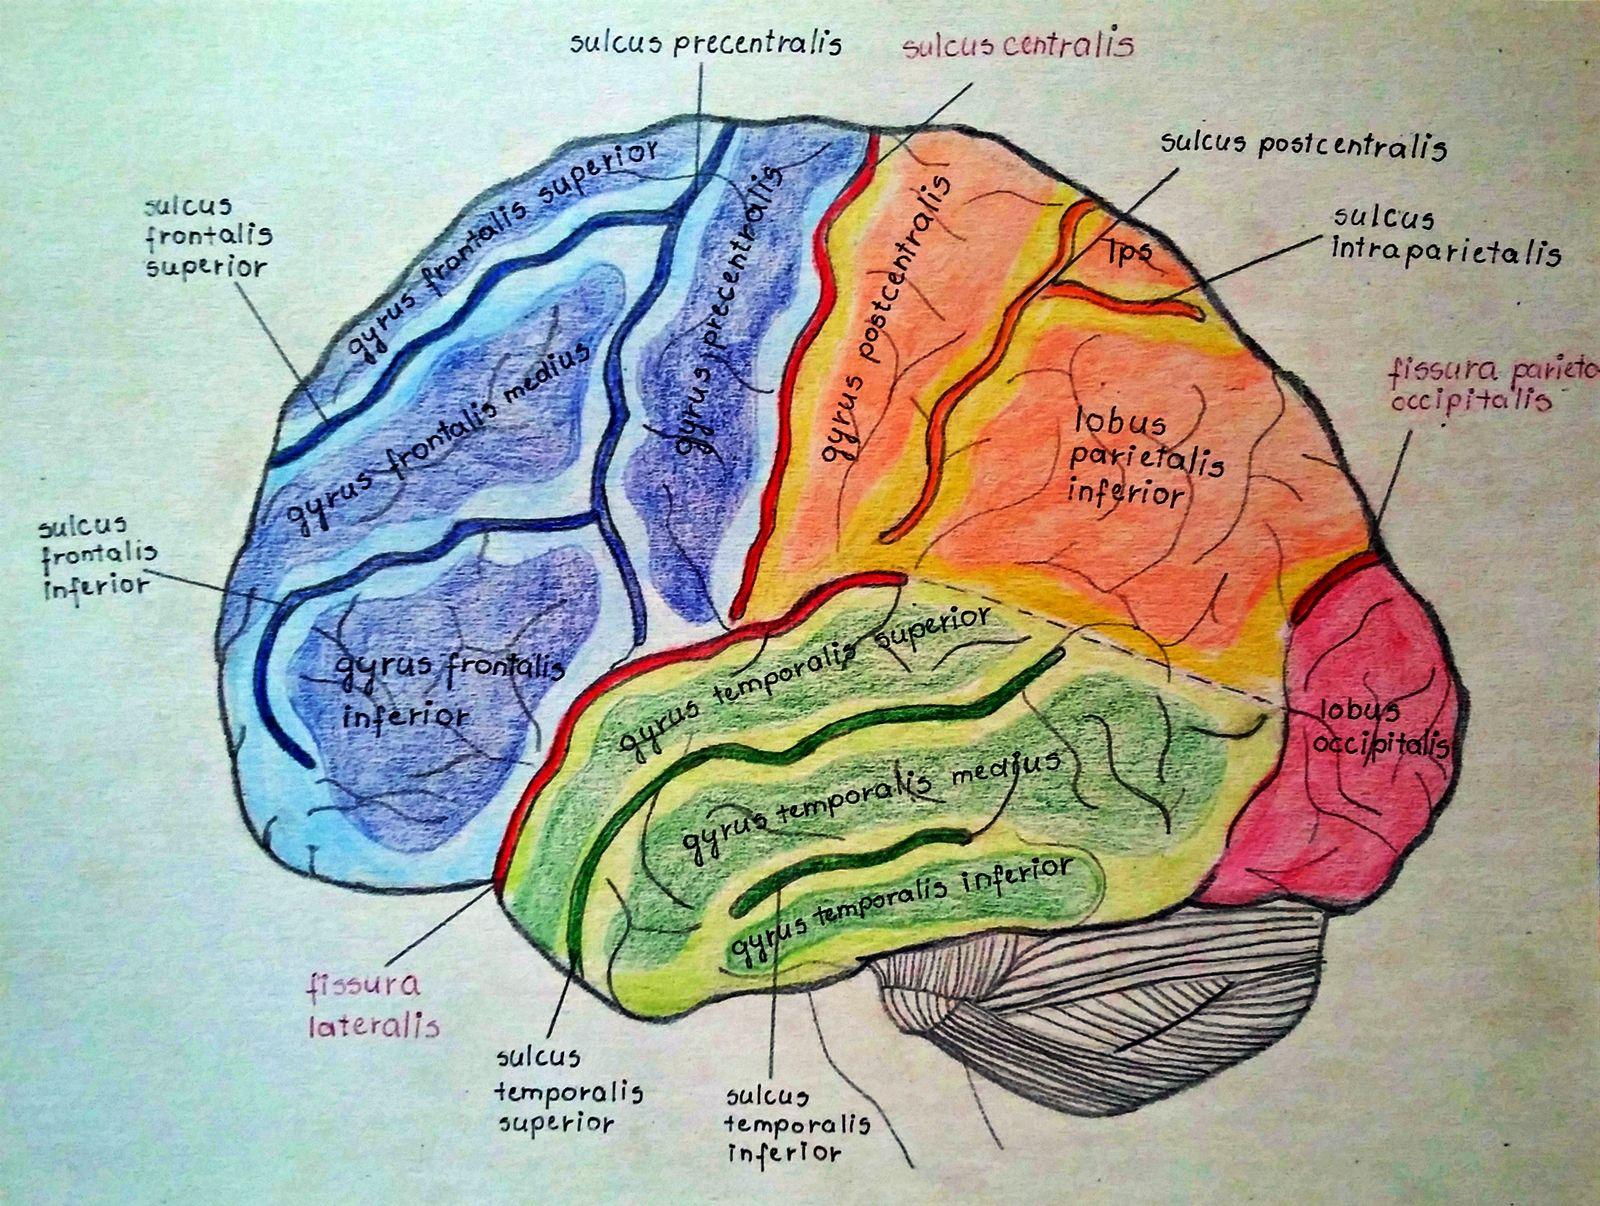 Telencephalon anatomy | Brain and Neuroscience | Pinterest | Anatomy ...